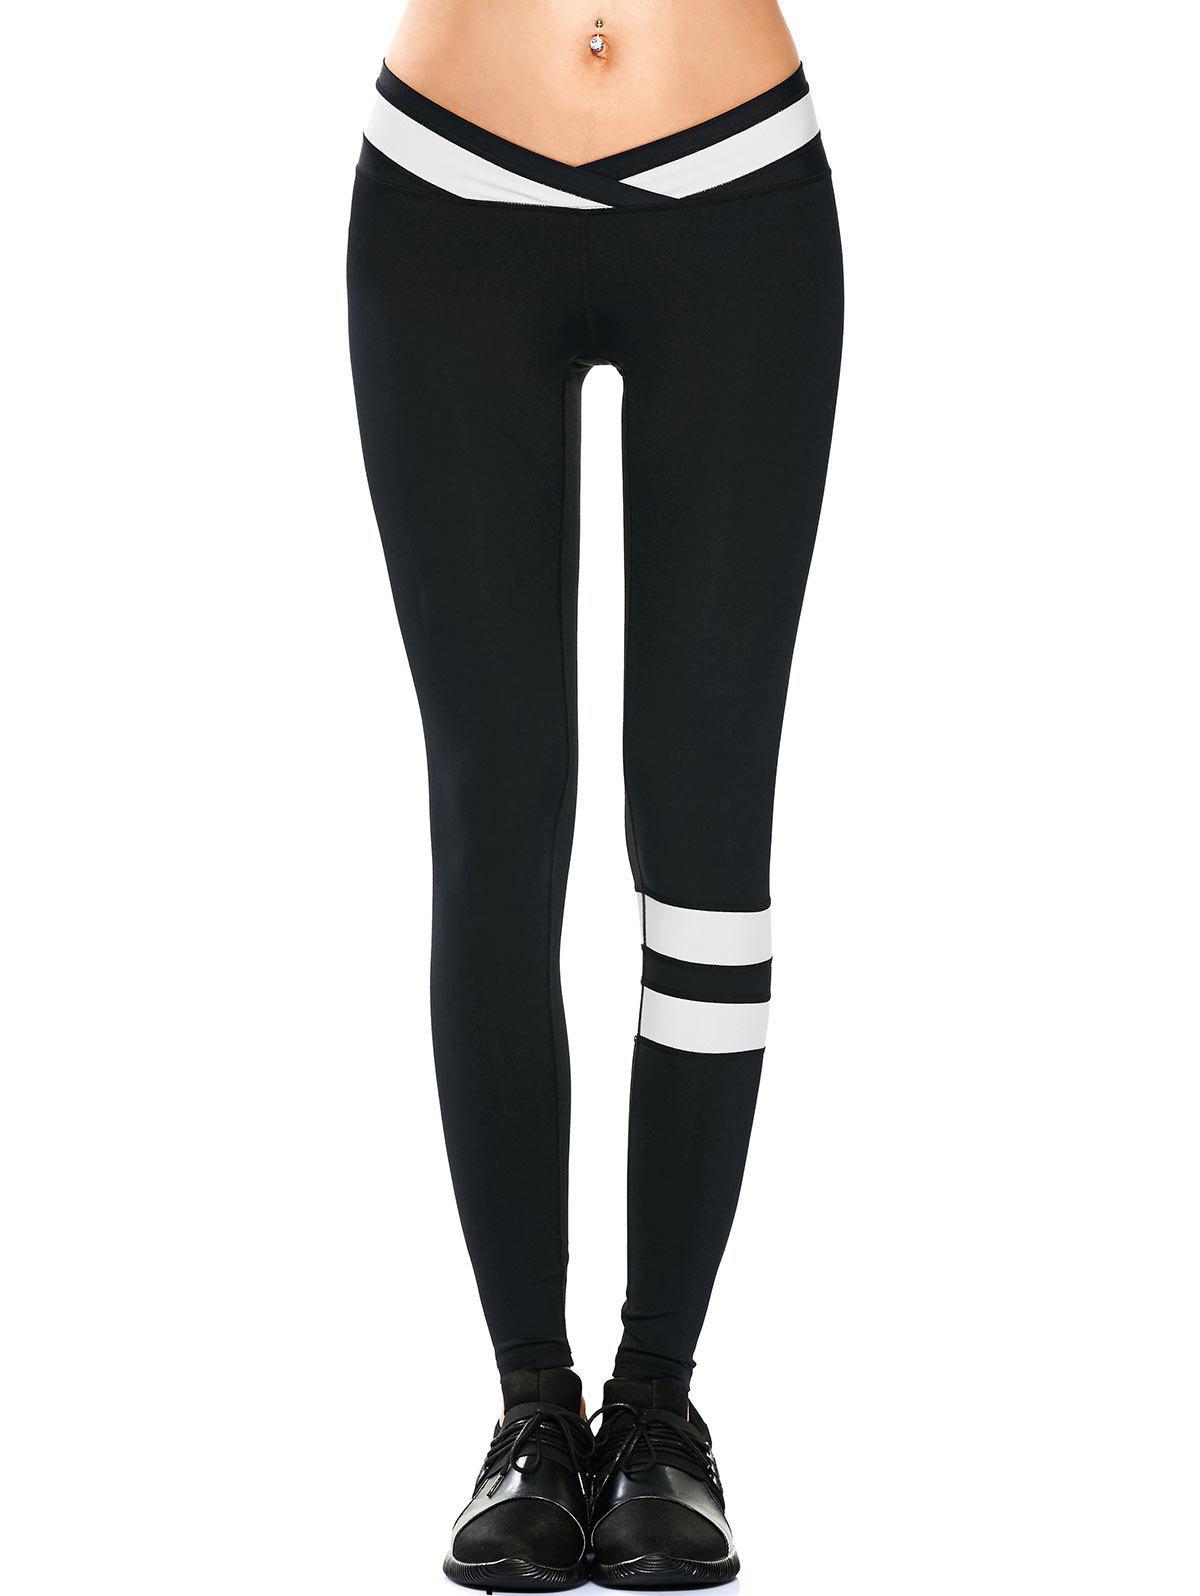 Activewear Two Tone Yoga Leggings 210926806